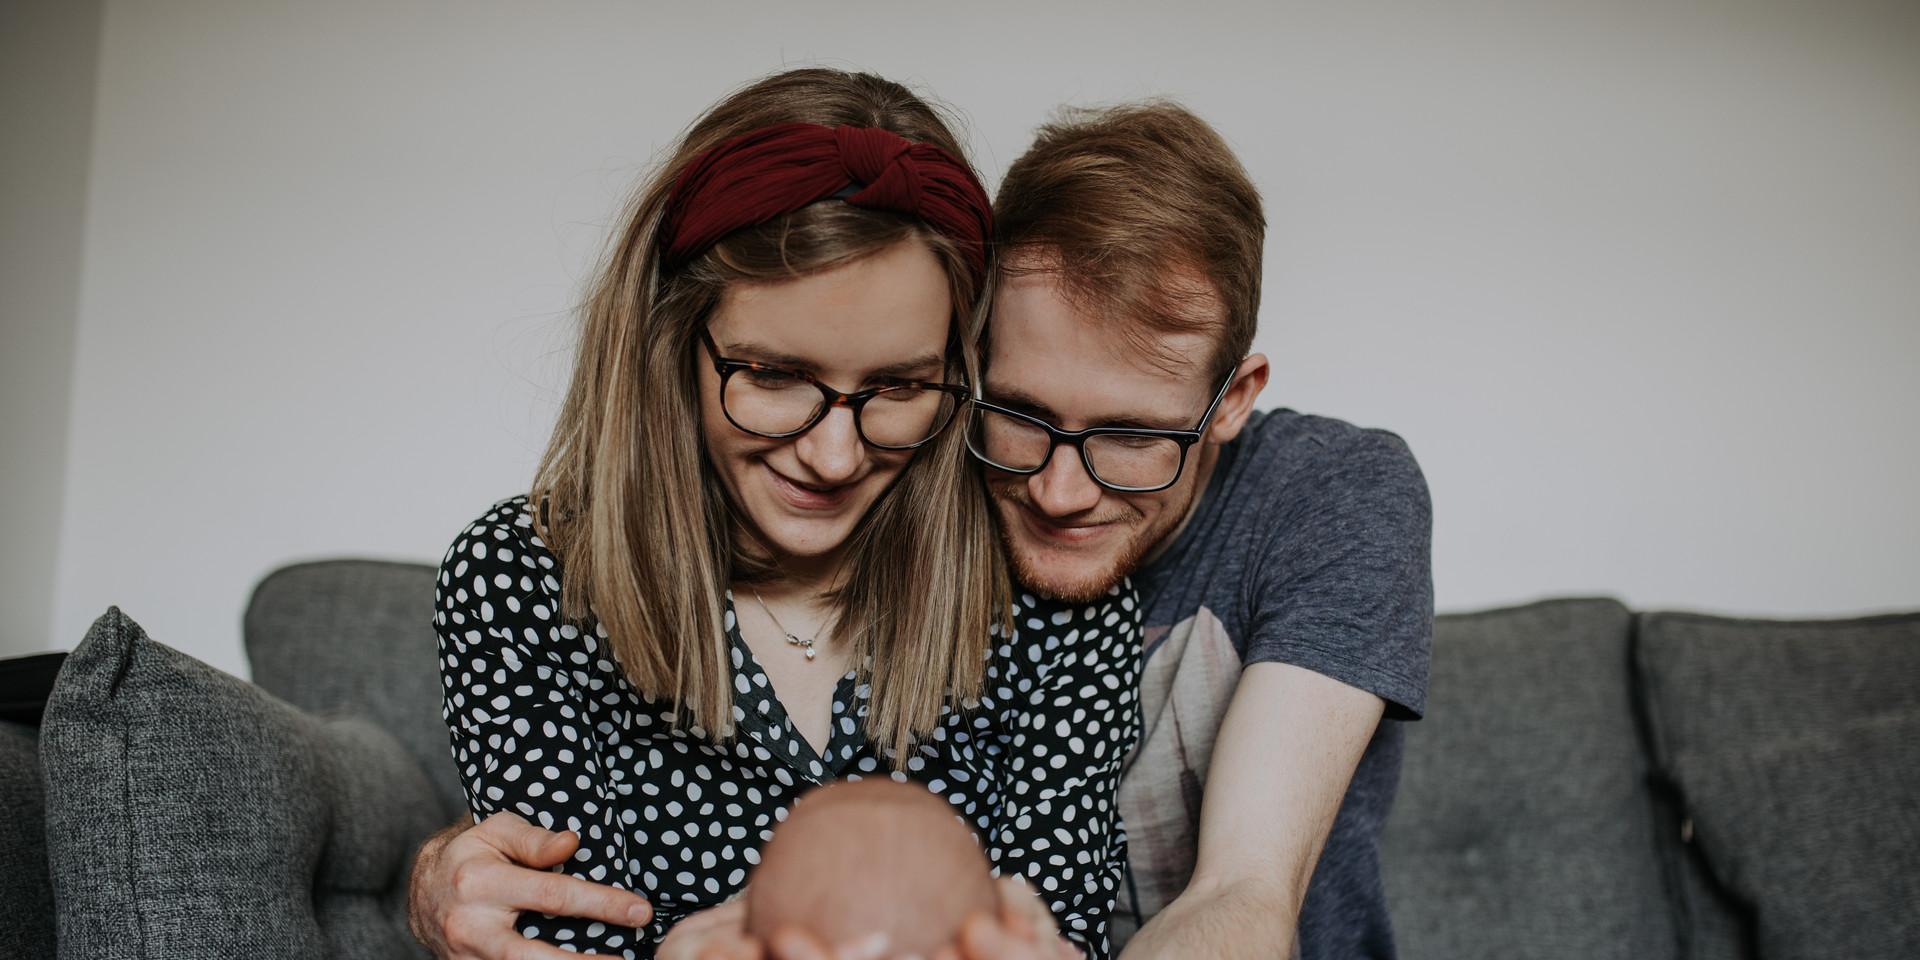 Newborn Baby Home Photoshoot expression